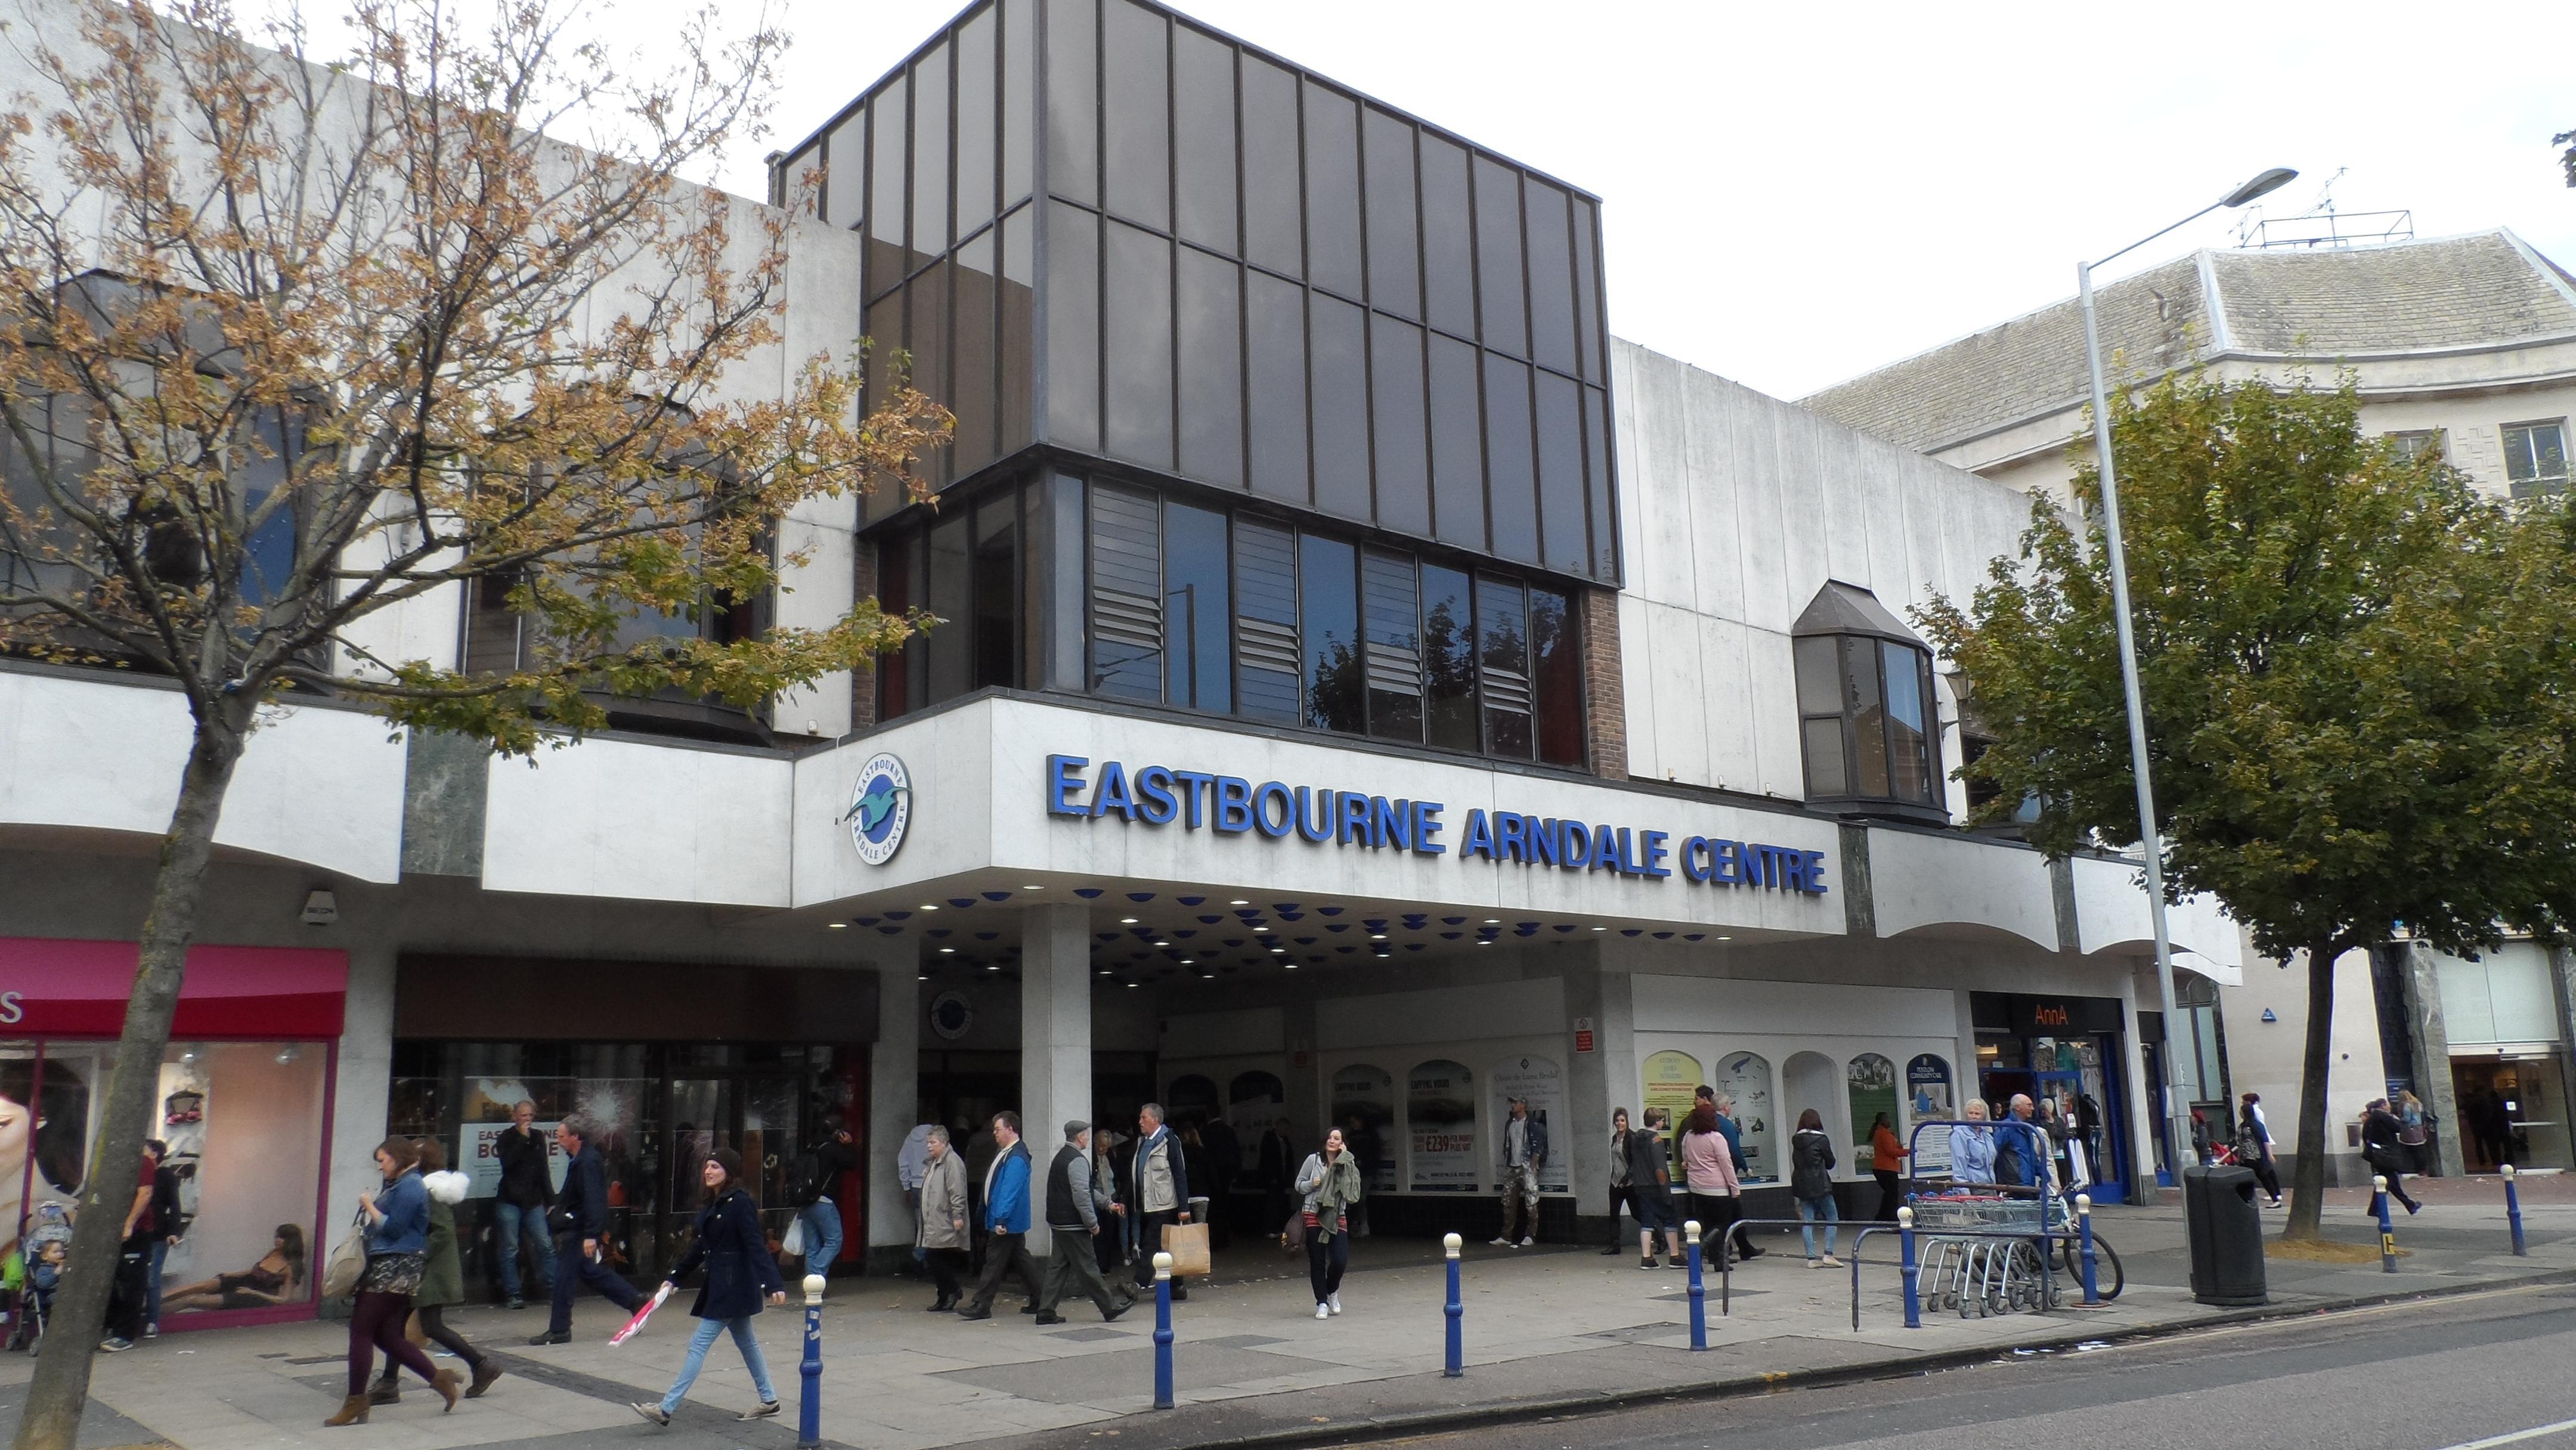 Eastbourne Arndale Centre Car Park